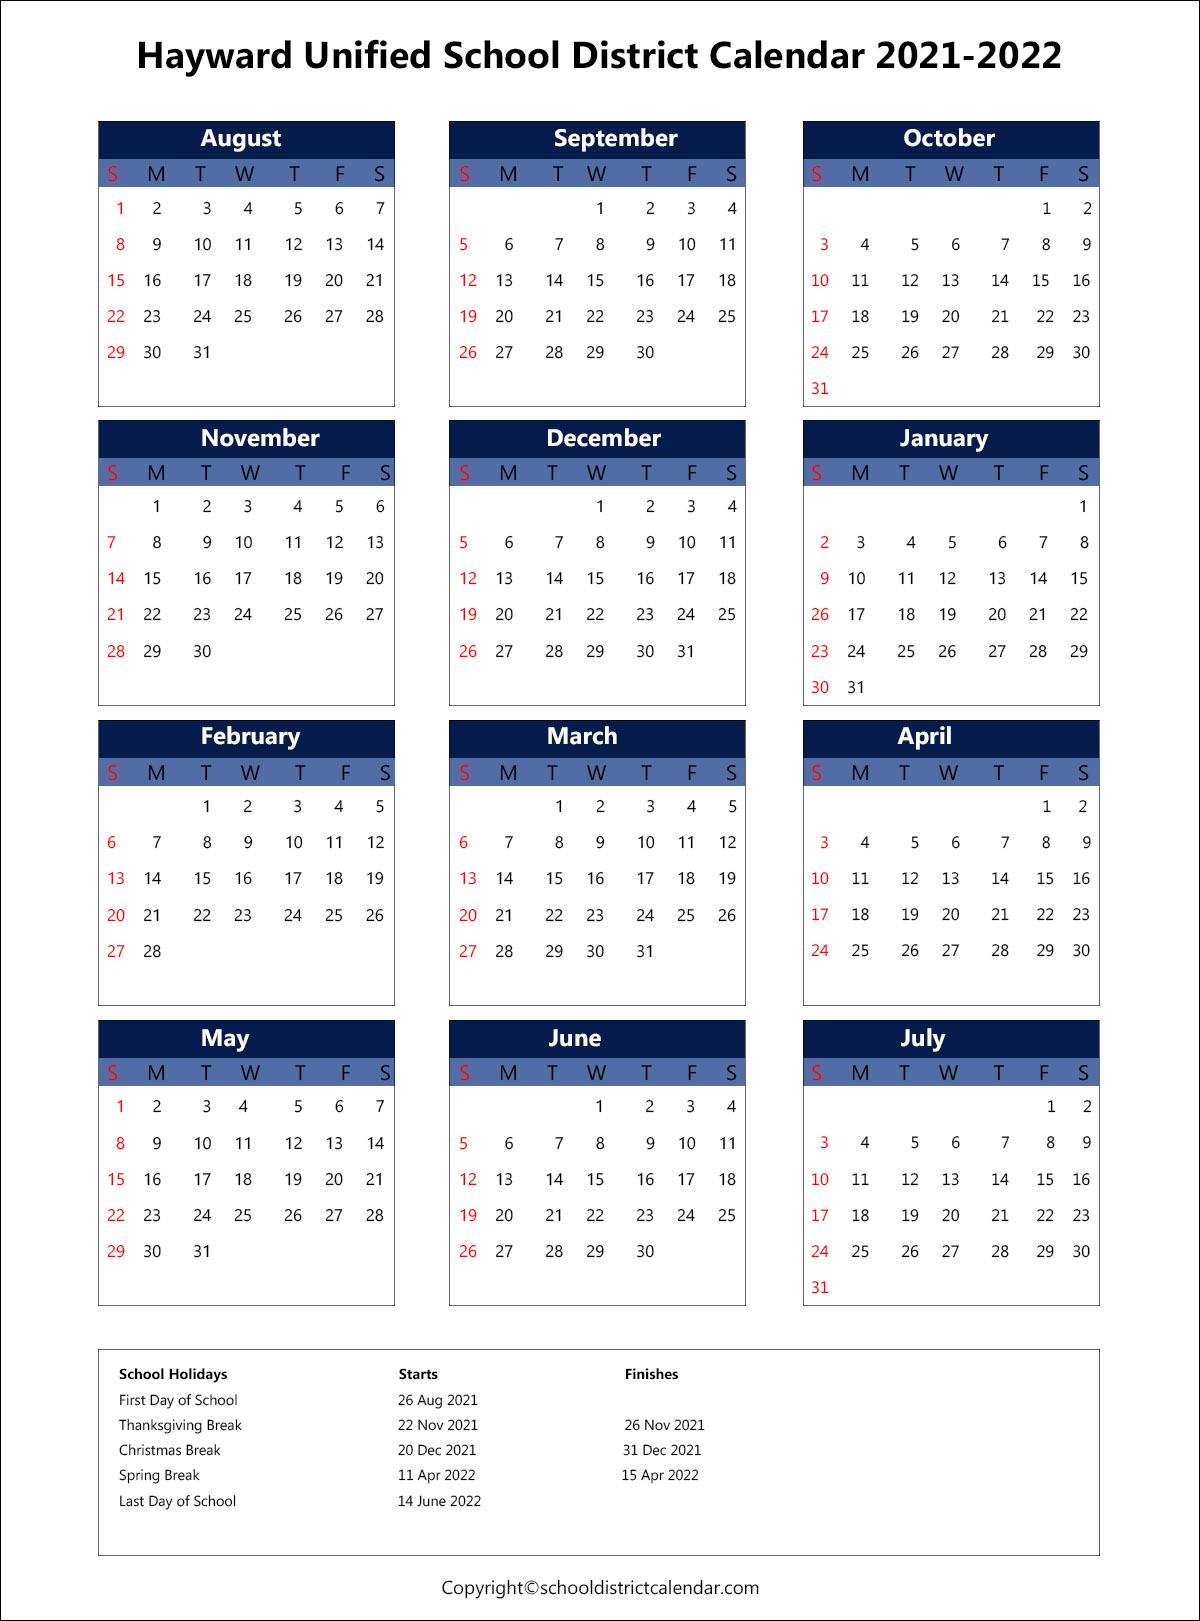 Hayward Unified School District Calendar 2021